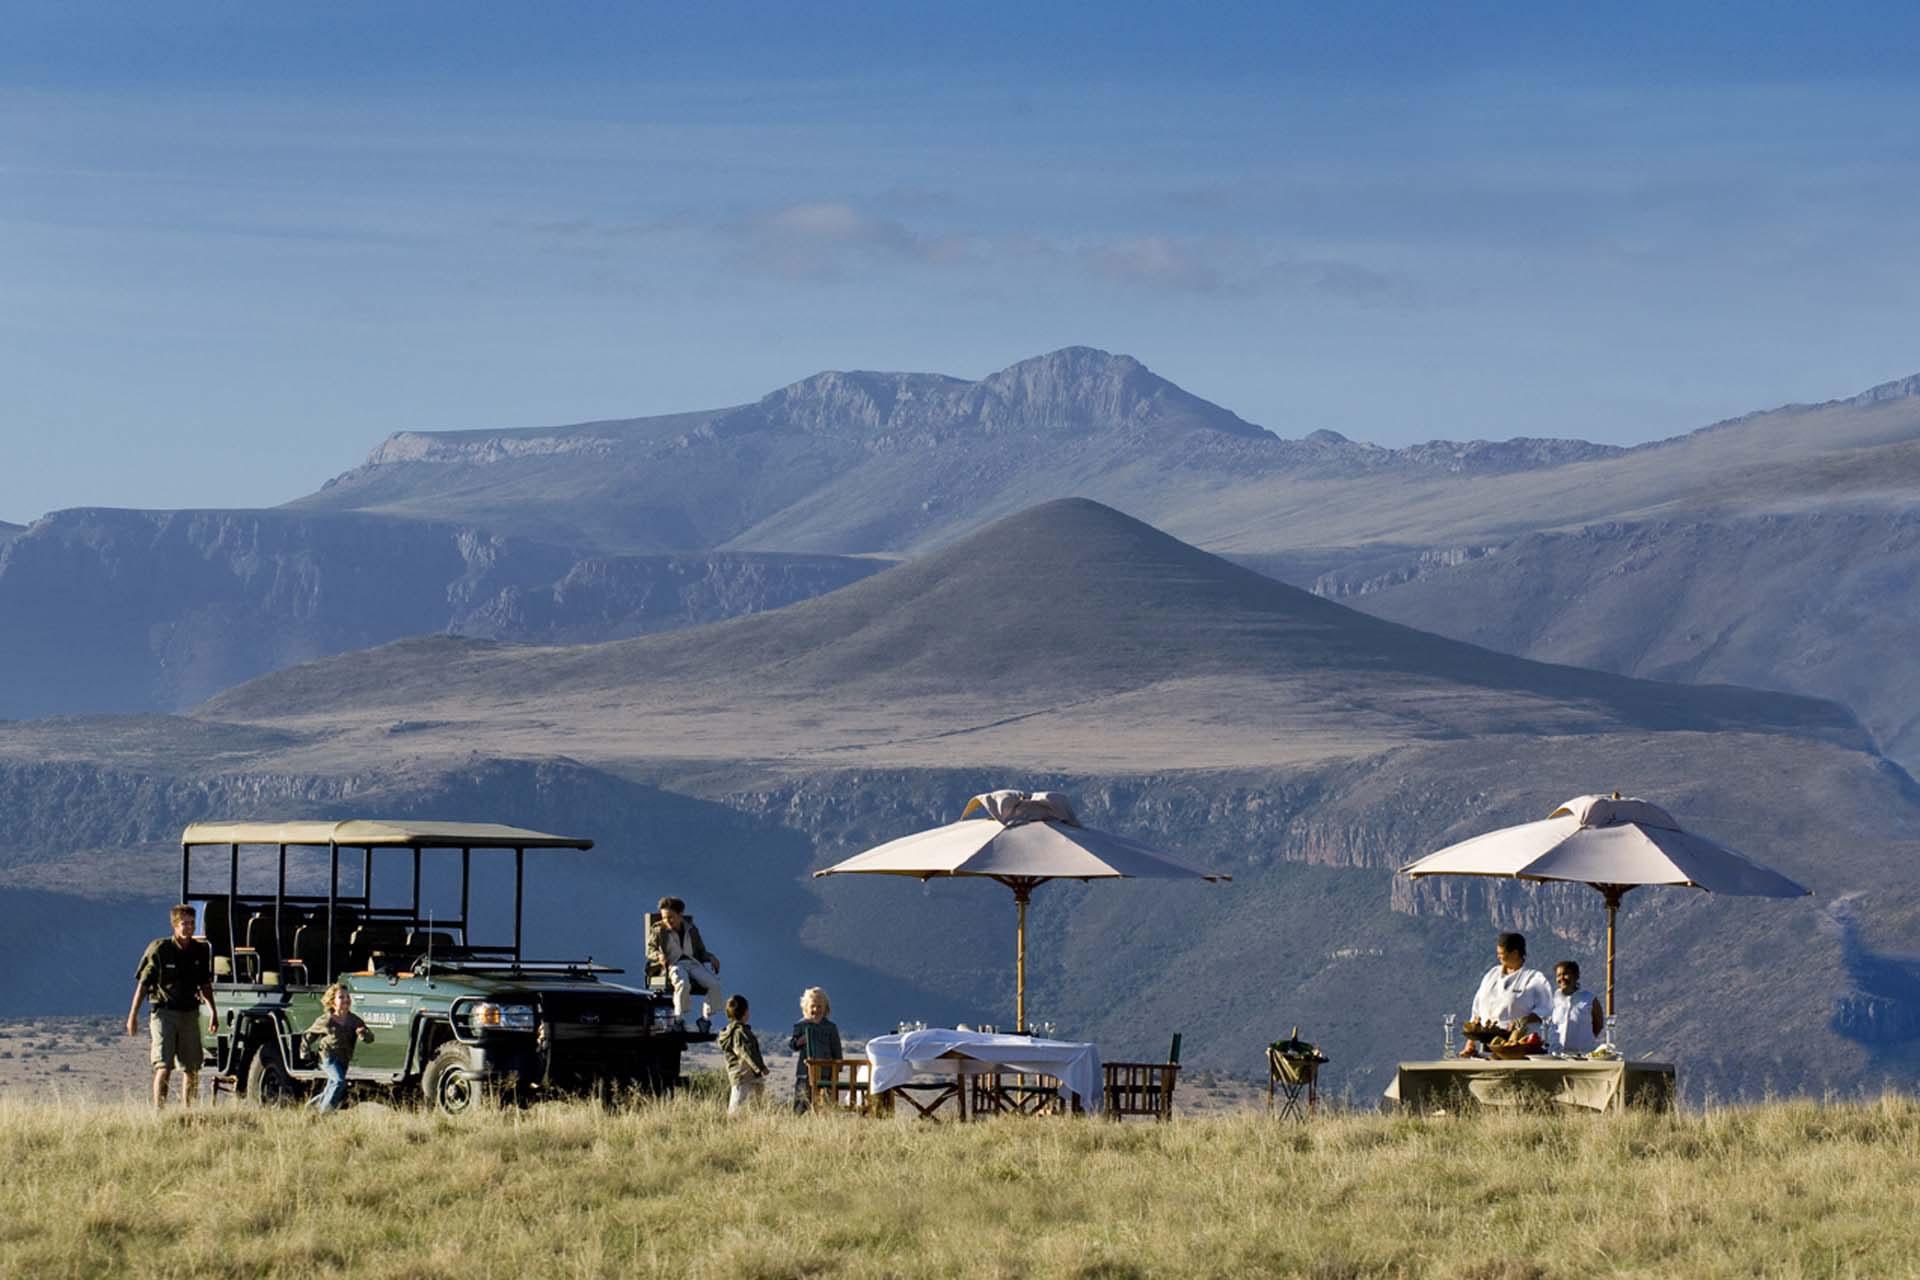 Samara picnic on a safari drive in the Eastern Cape South Africa